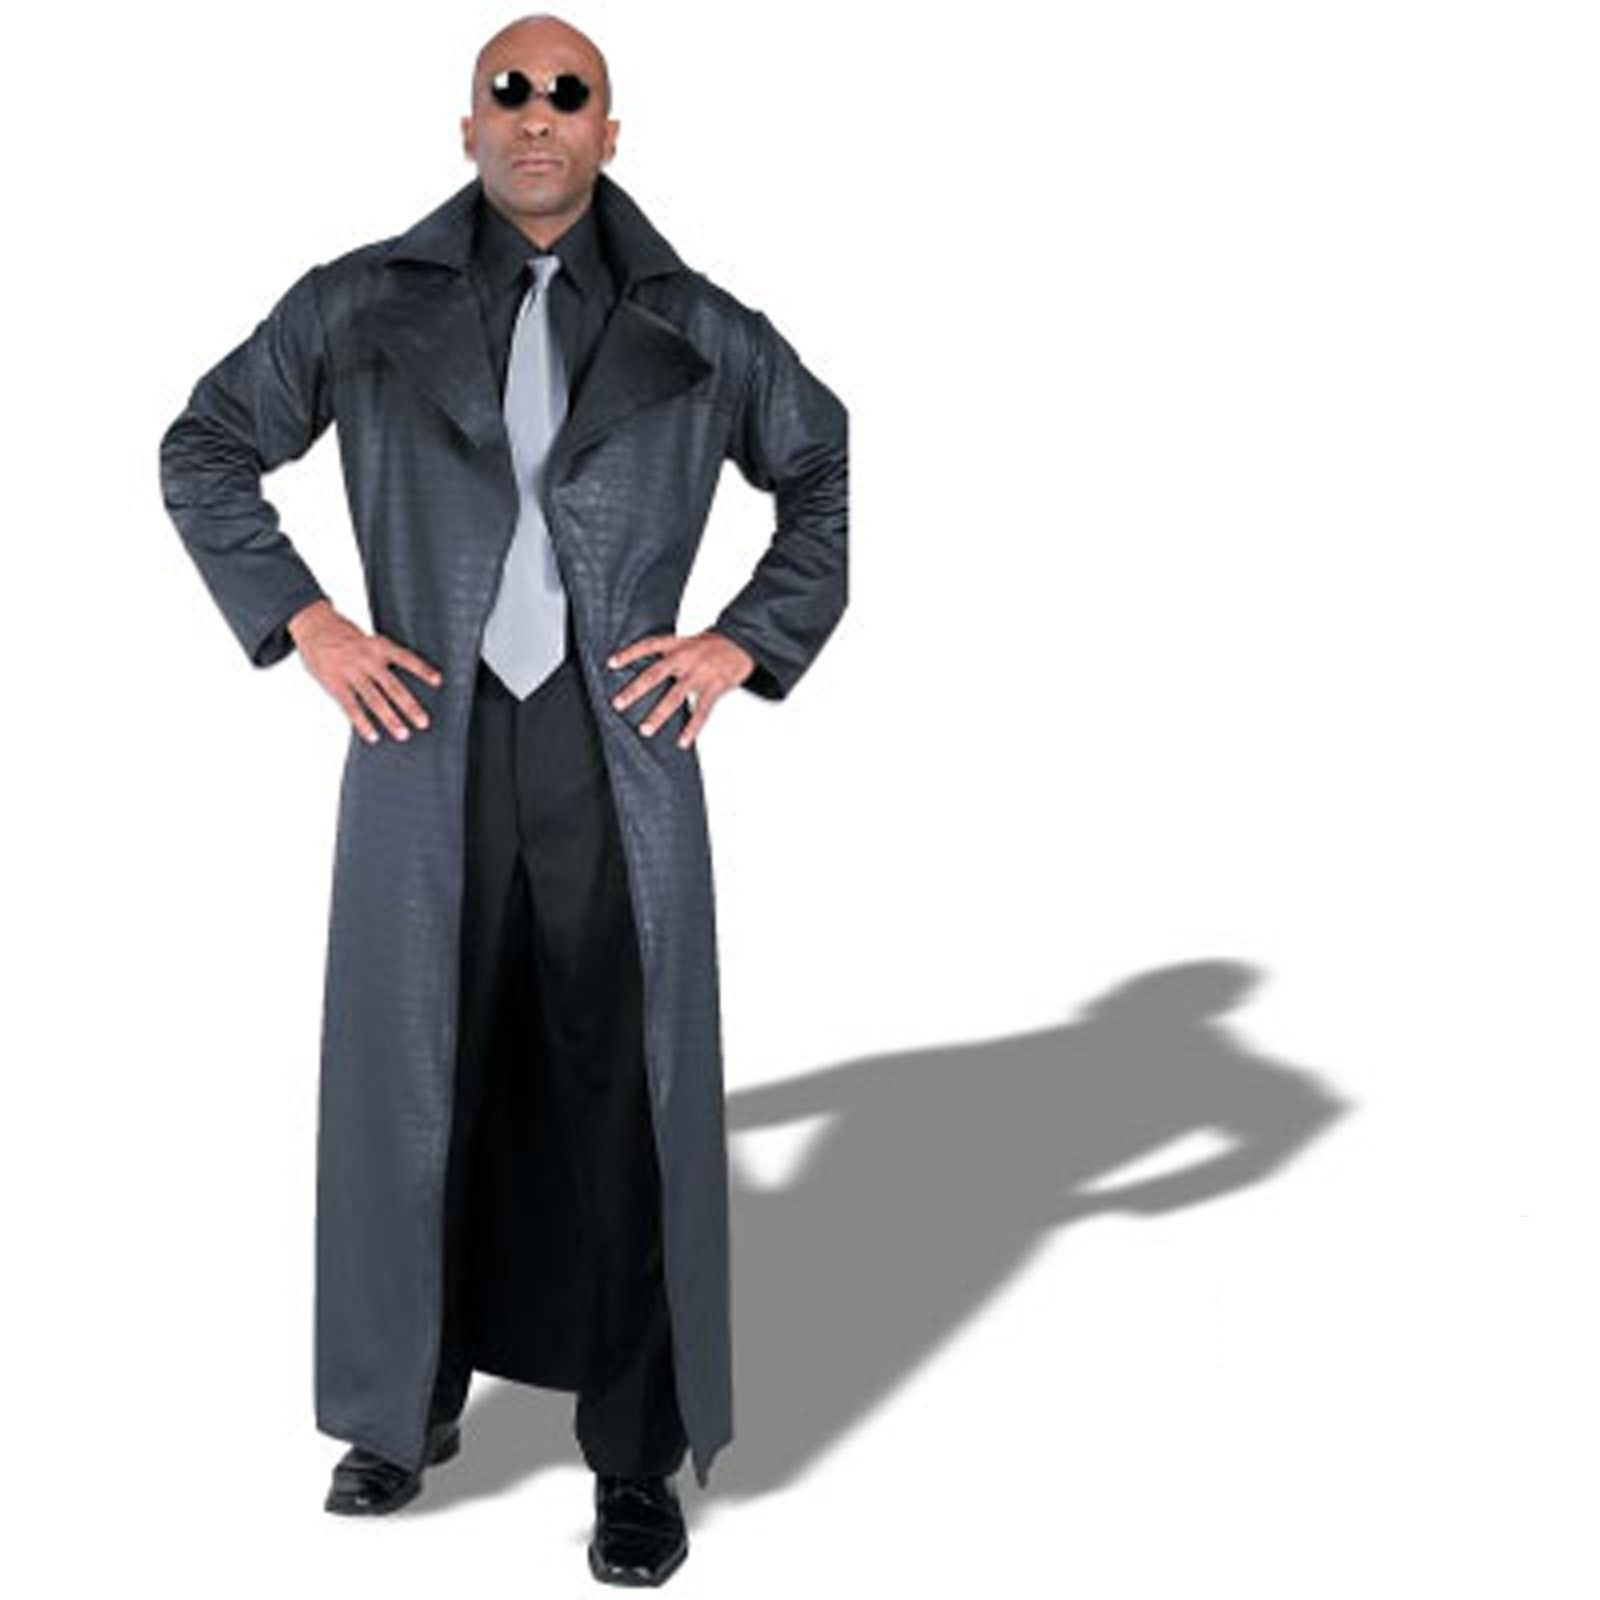 Matrix Morpheus Adult Costume - Includes: long black coat with ...